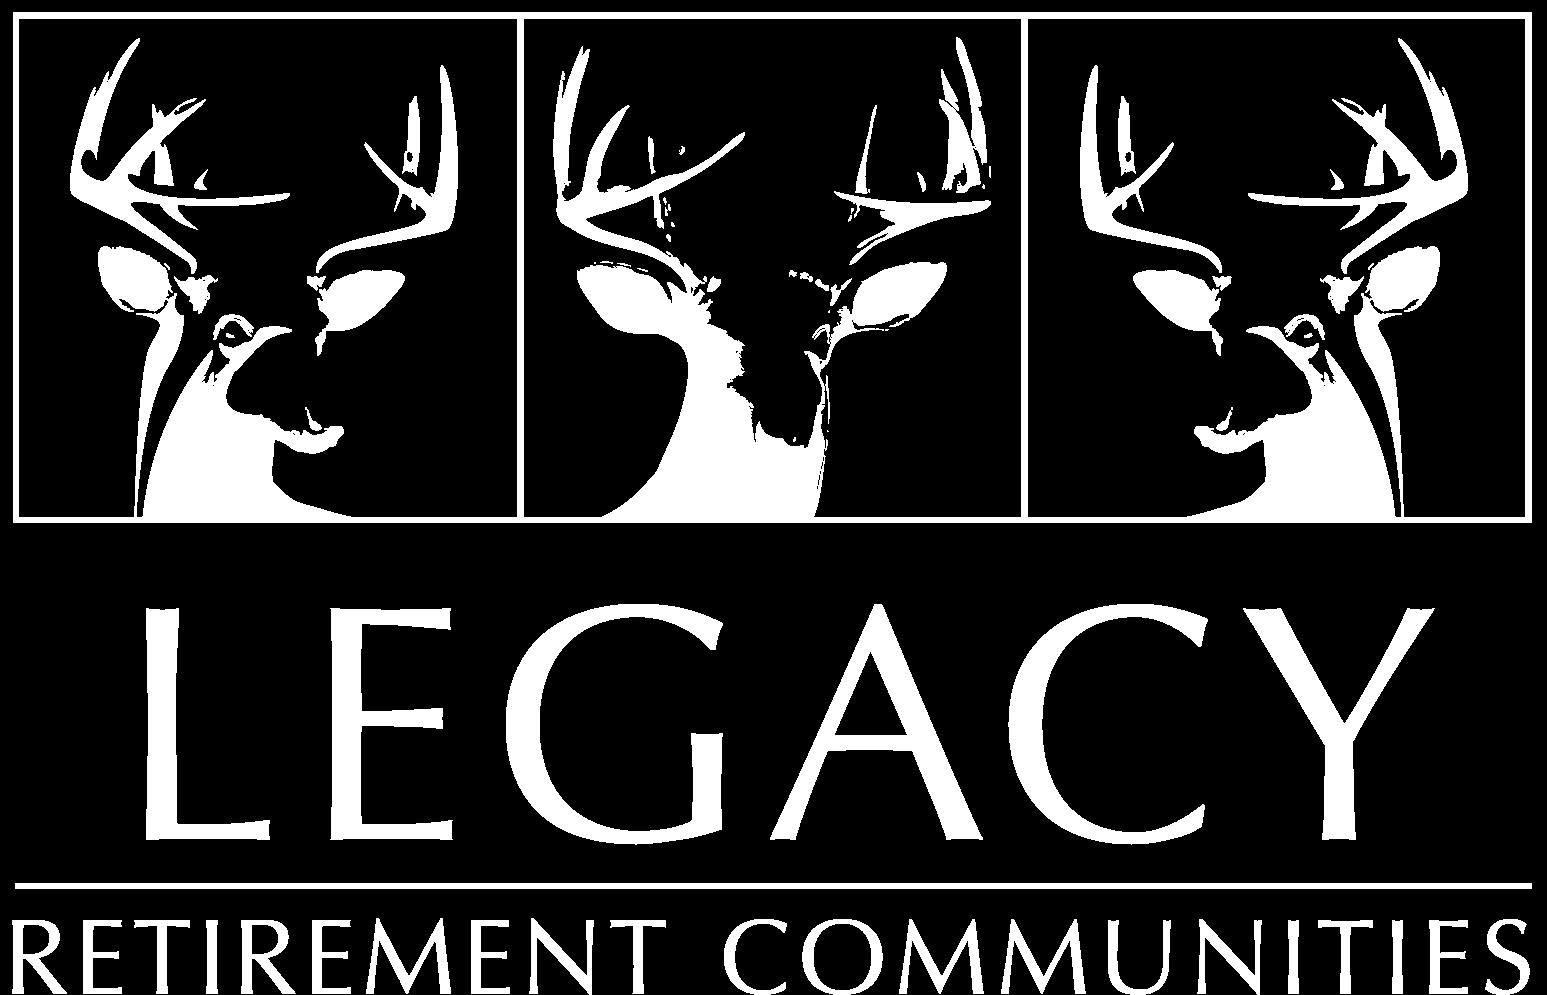 Legacy Retirement Communities